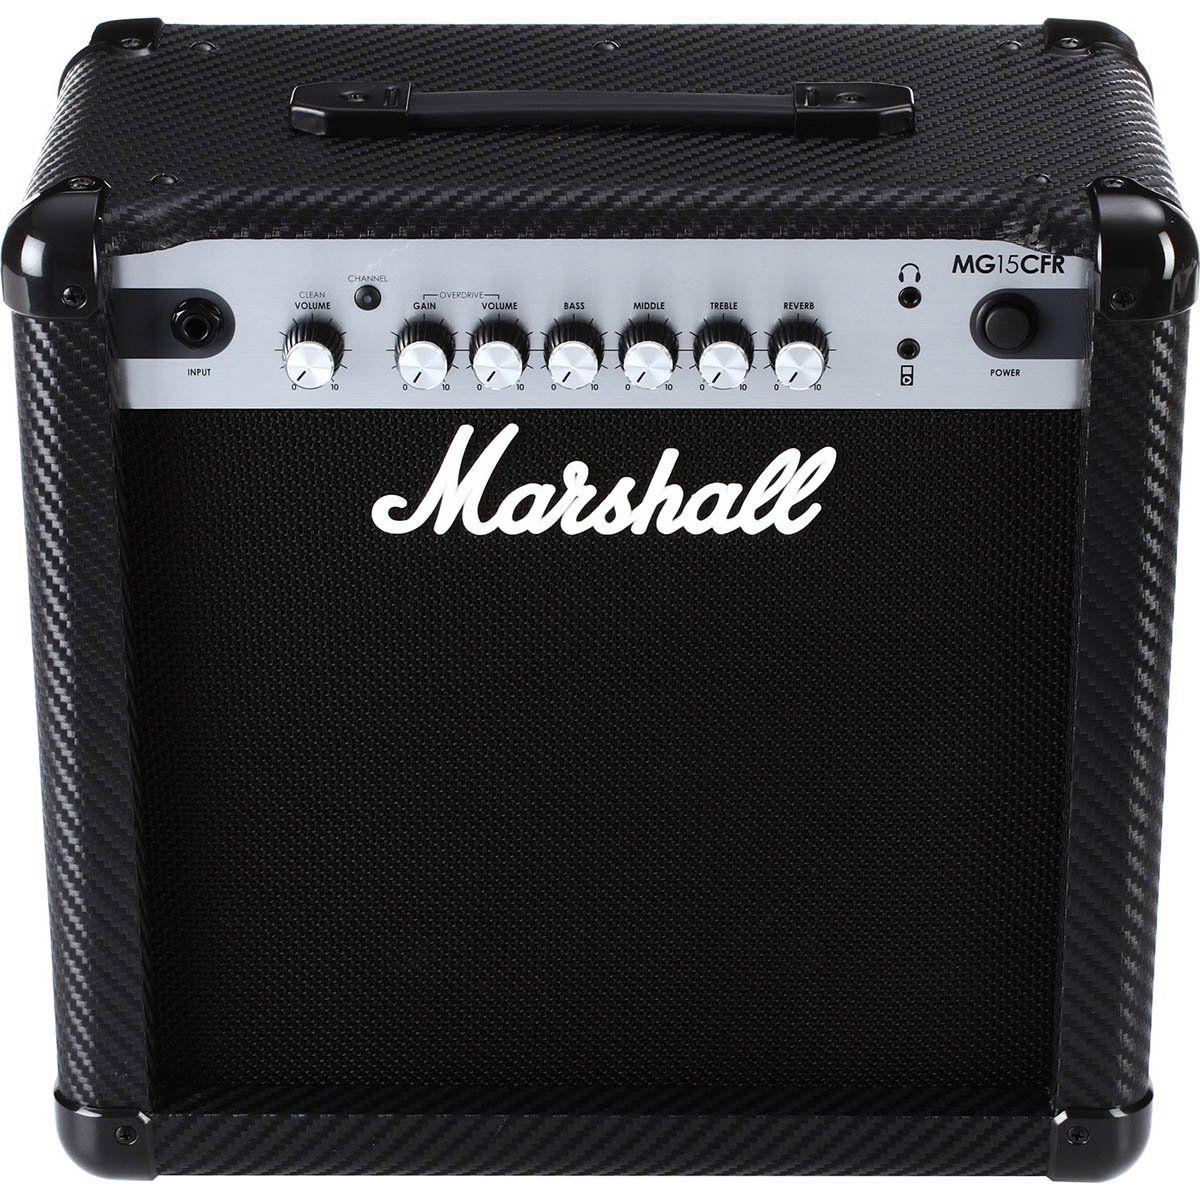 Marshall MG15CFR Amplificador Combo para Guitarra 15w de Potência